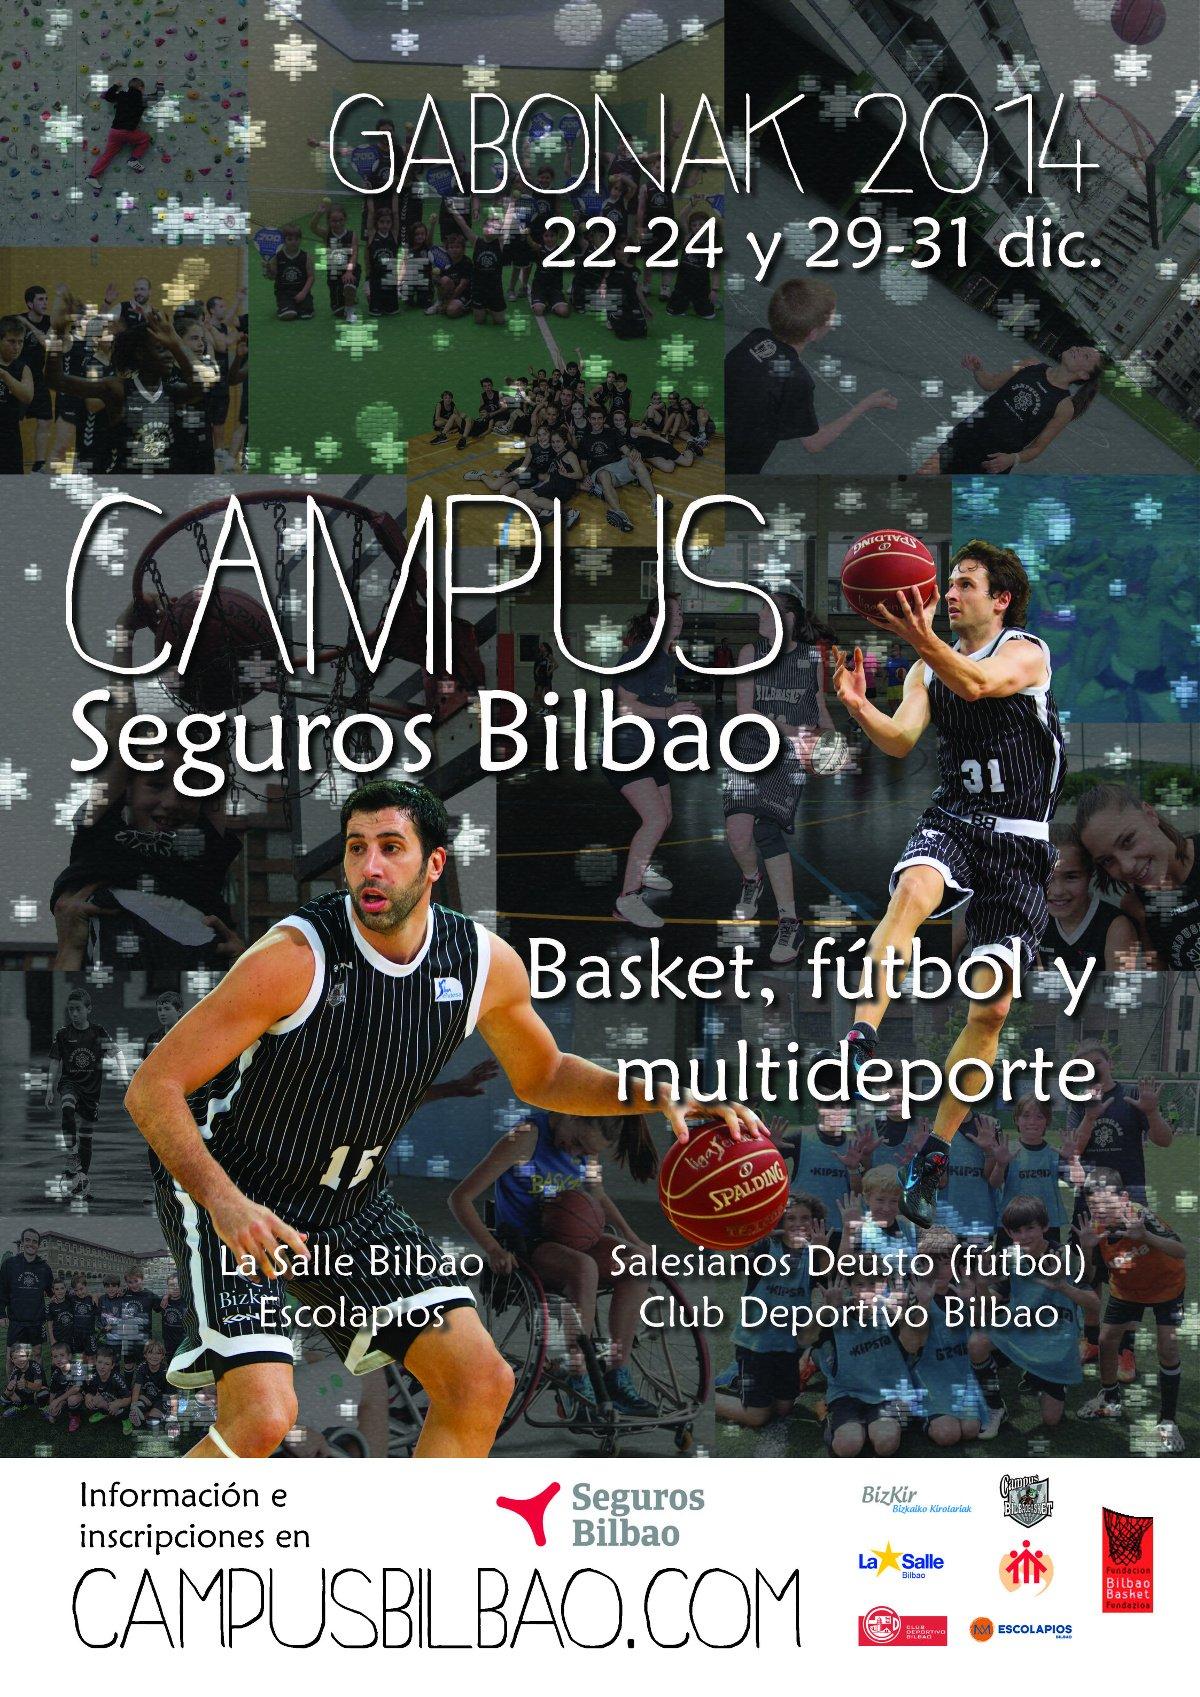 Campus Seguros Bilbao Basket, fútbol y multideporte